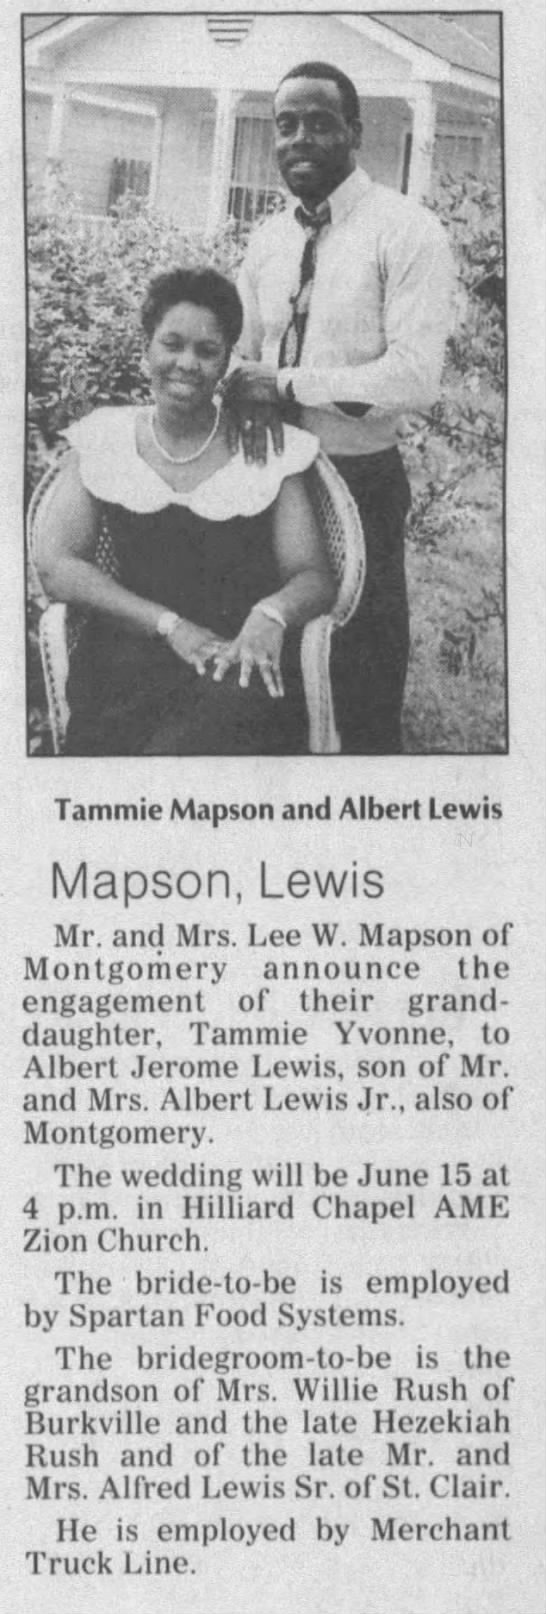 Tammie Mapson and Albert Lewis Wedding Announcement - i - I EL. Tammie Mapson and Albert Lewis...